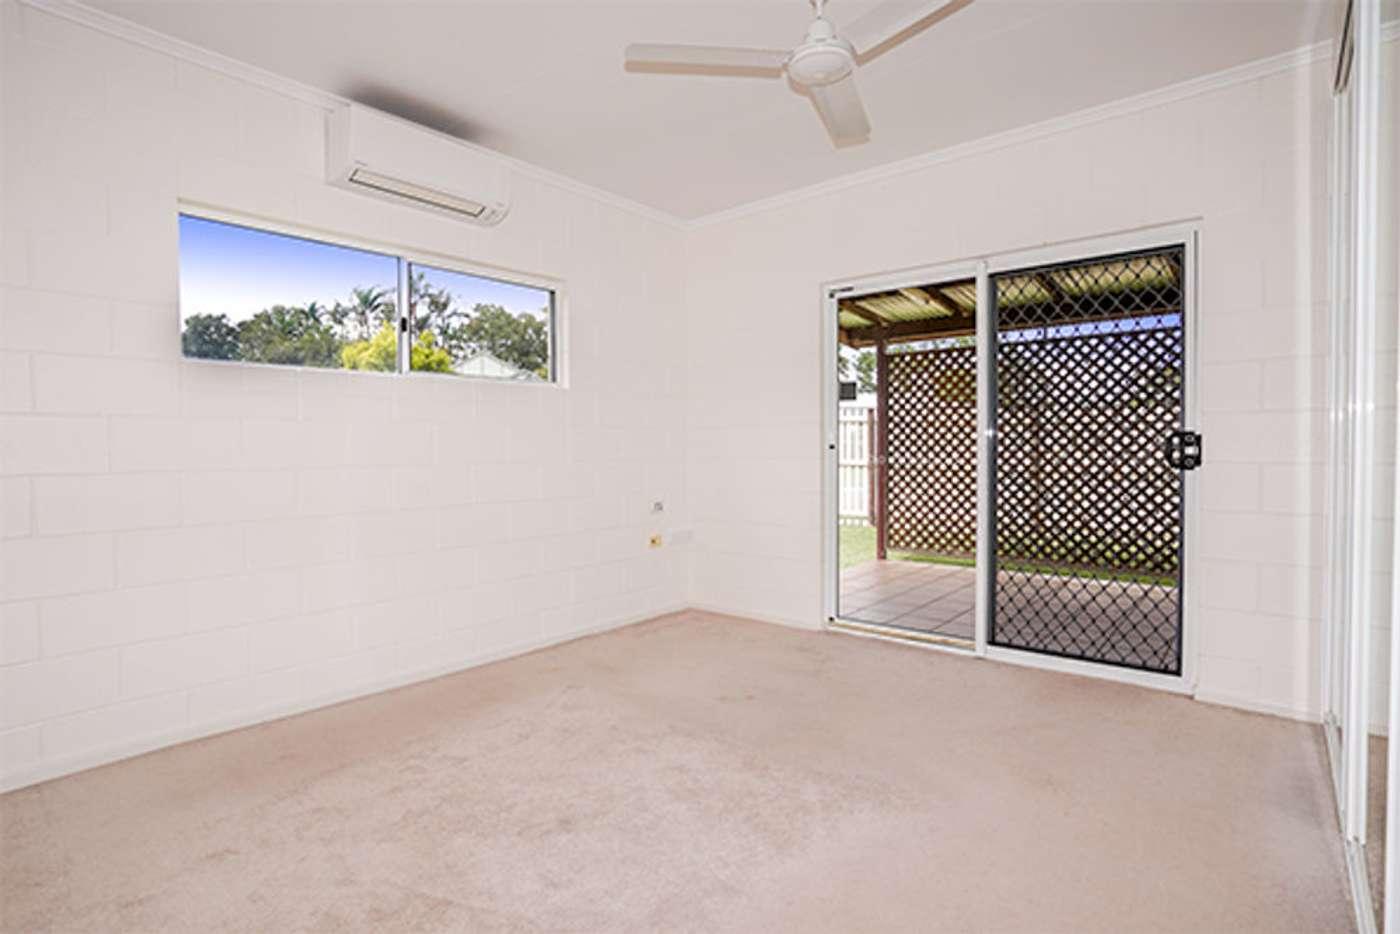 Seventh view of Homely house listing, 1 Brodziac Close, Mareeba QLD 4880